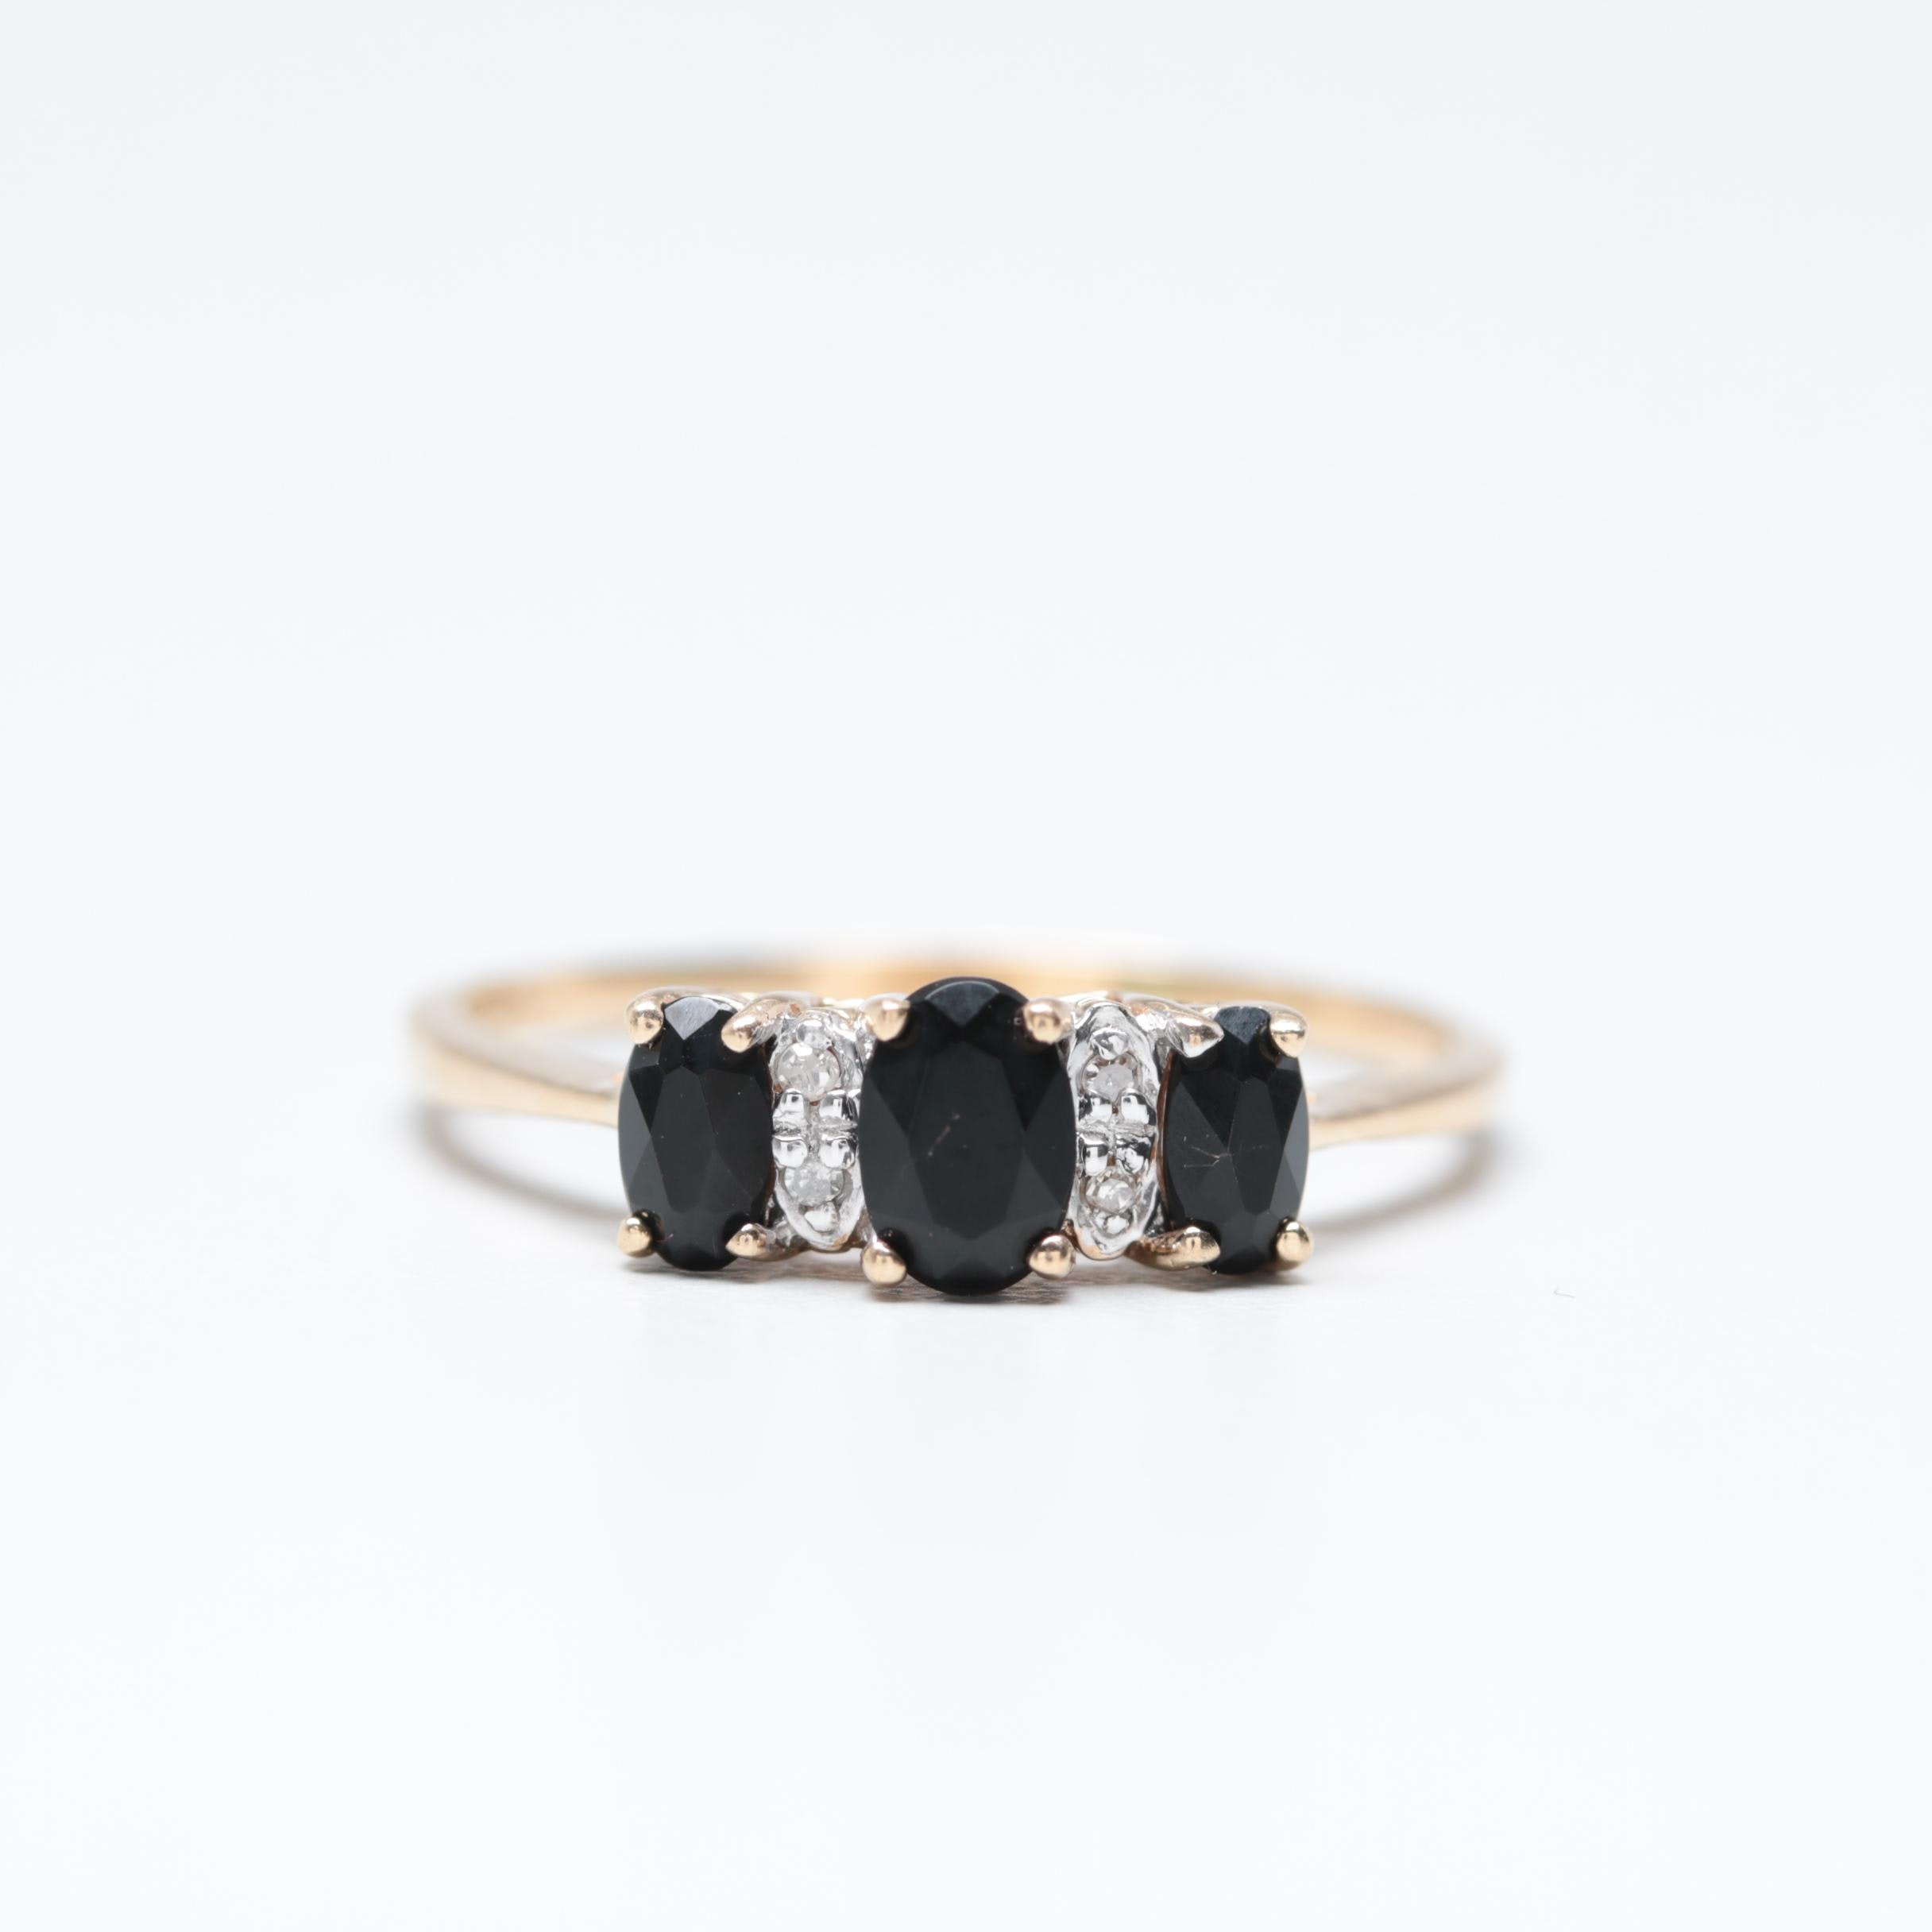 10K Yellow Gold Black Cubic Zirconia and Diamond Ring